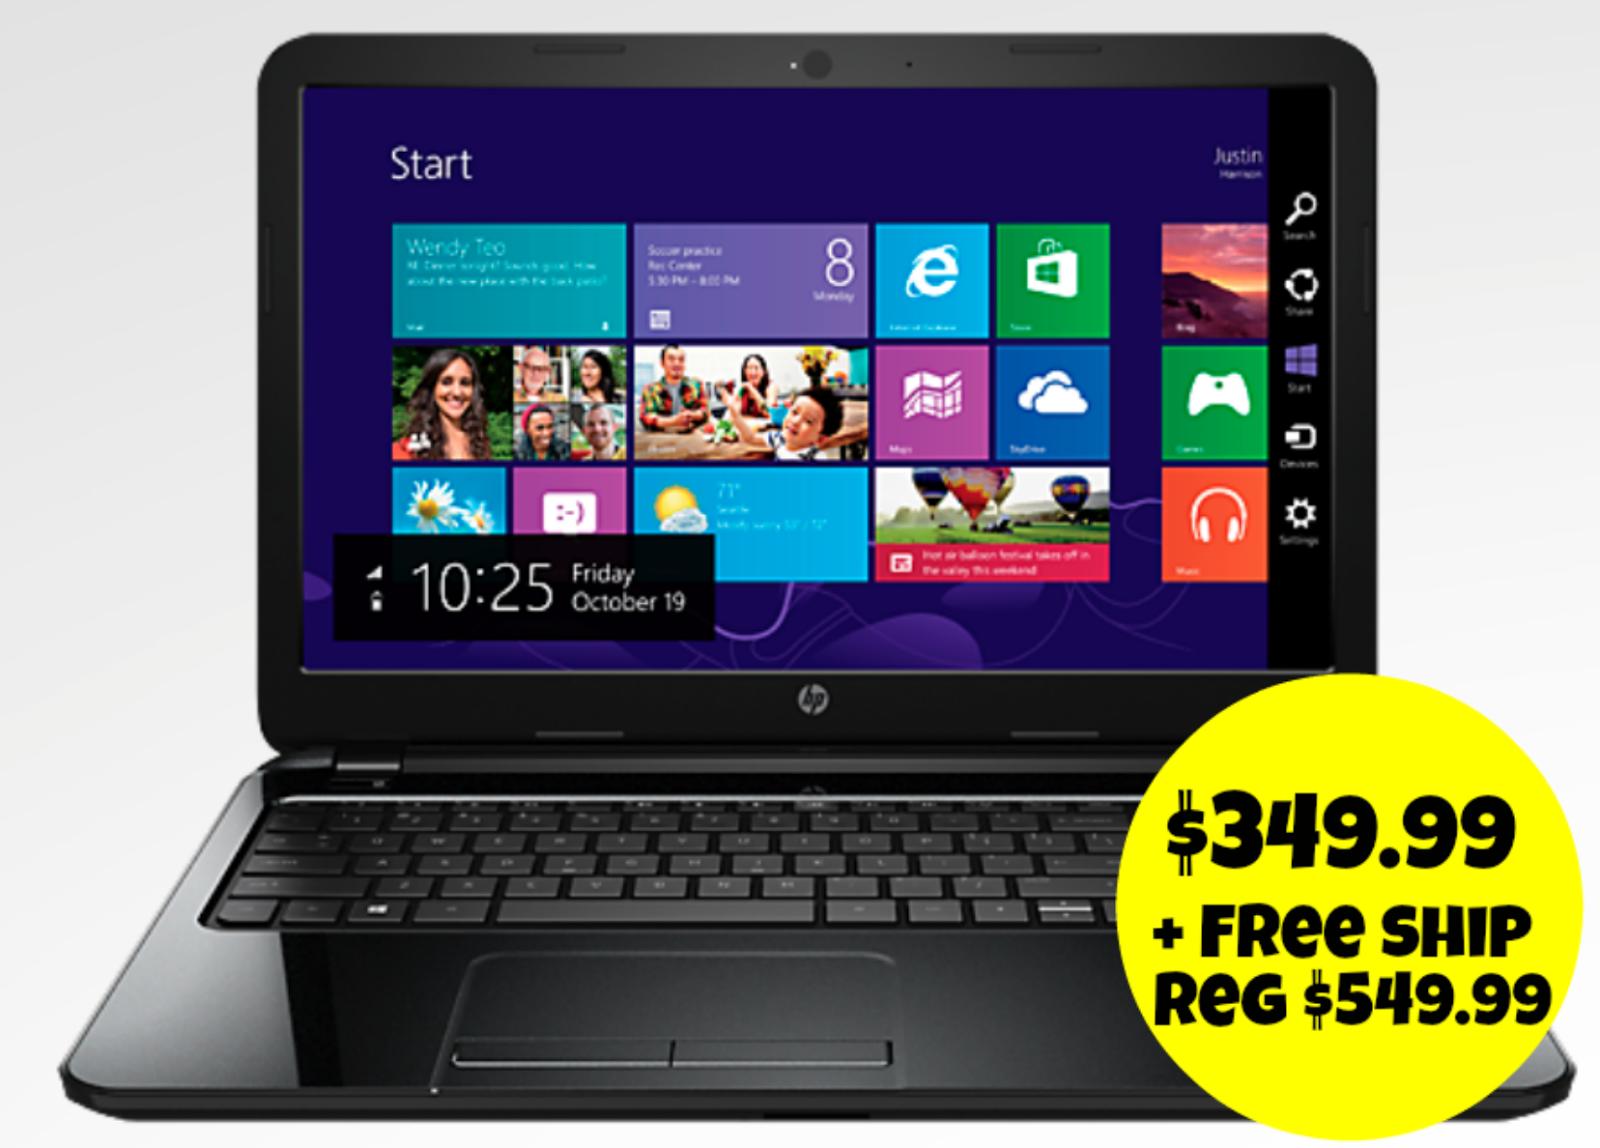 http://www.thebinderladies.com/2015/02/hp-15z-quad-core-touch-laptop-34999.html#.VNO5jYfduyM